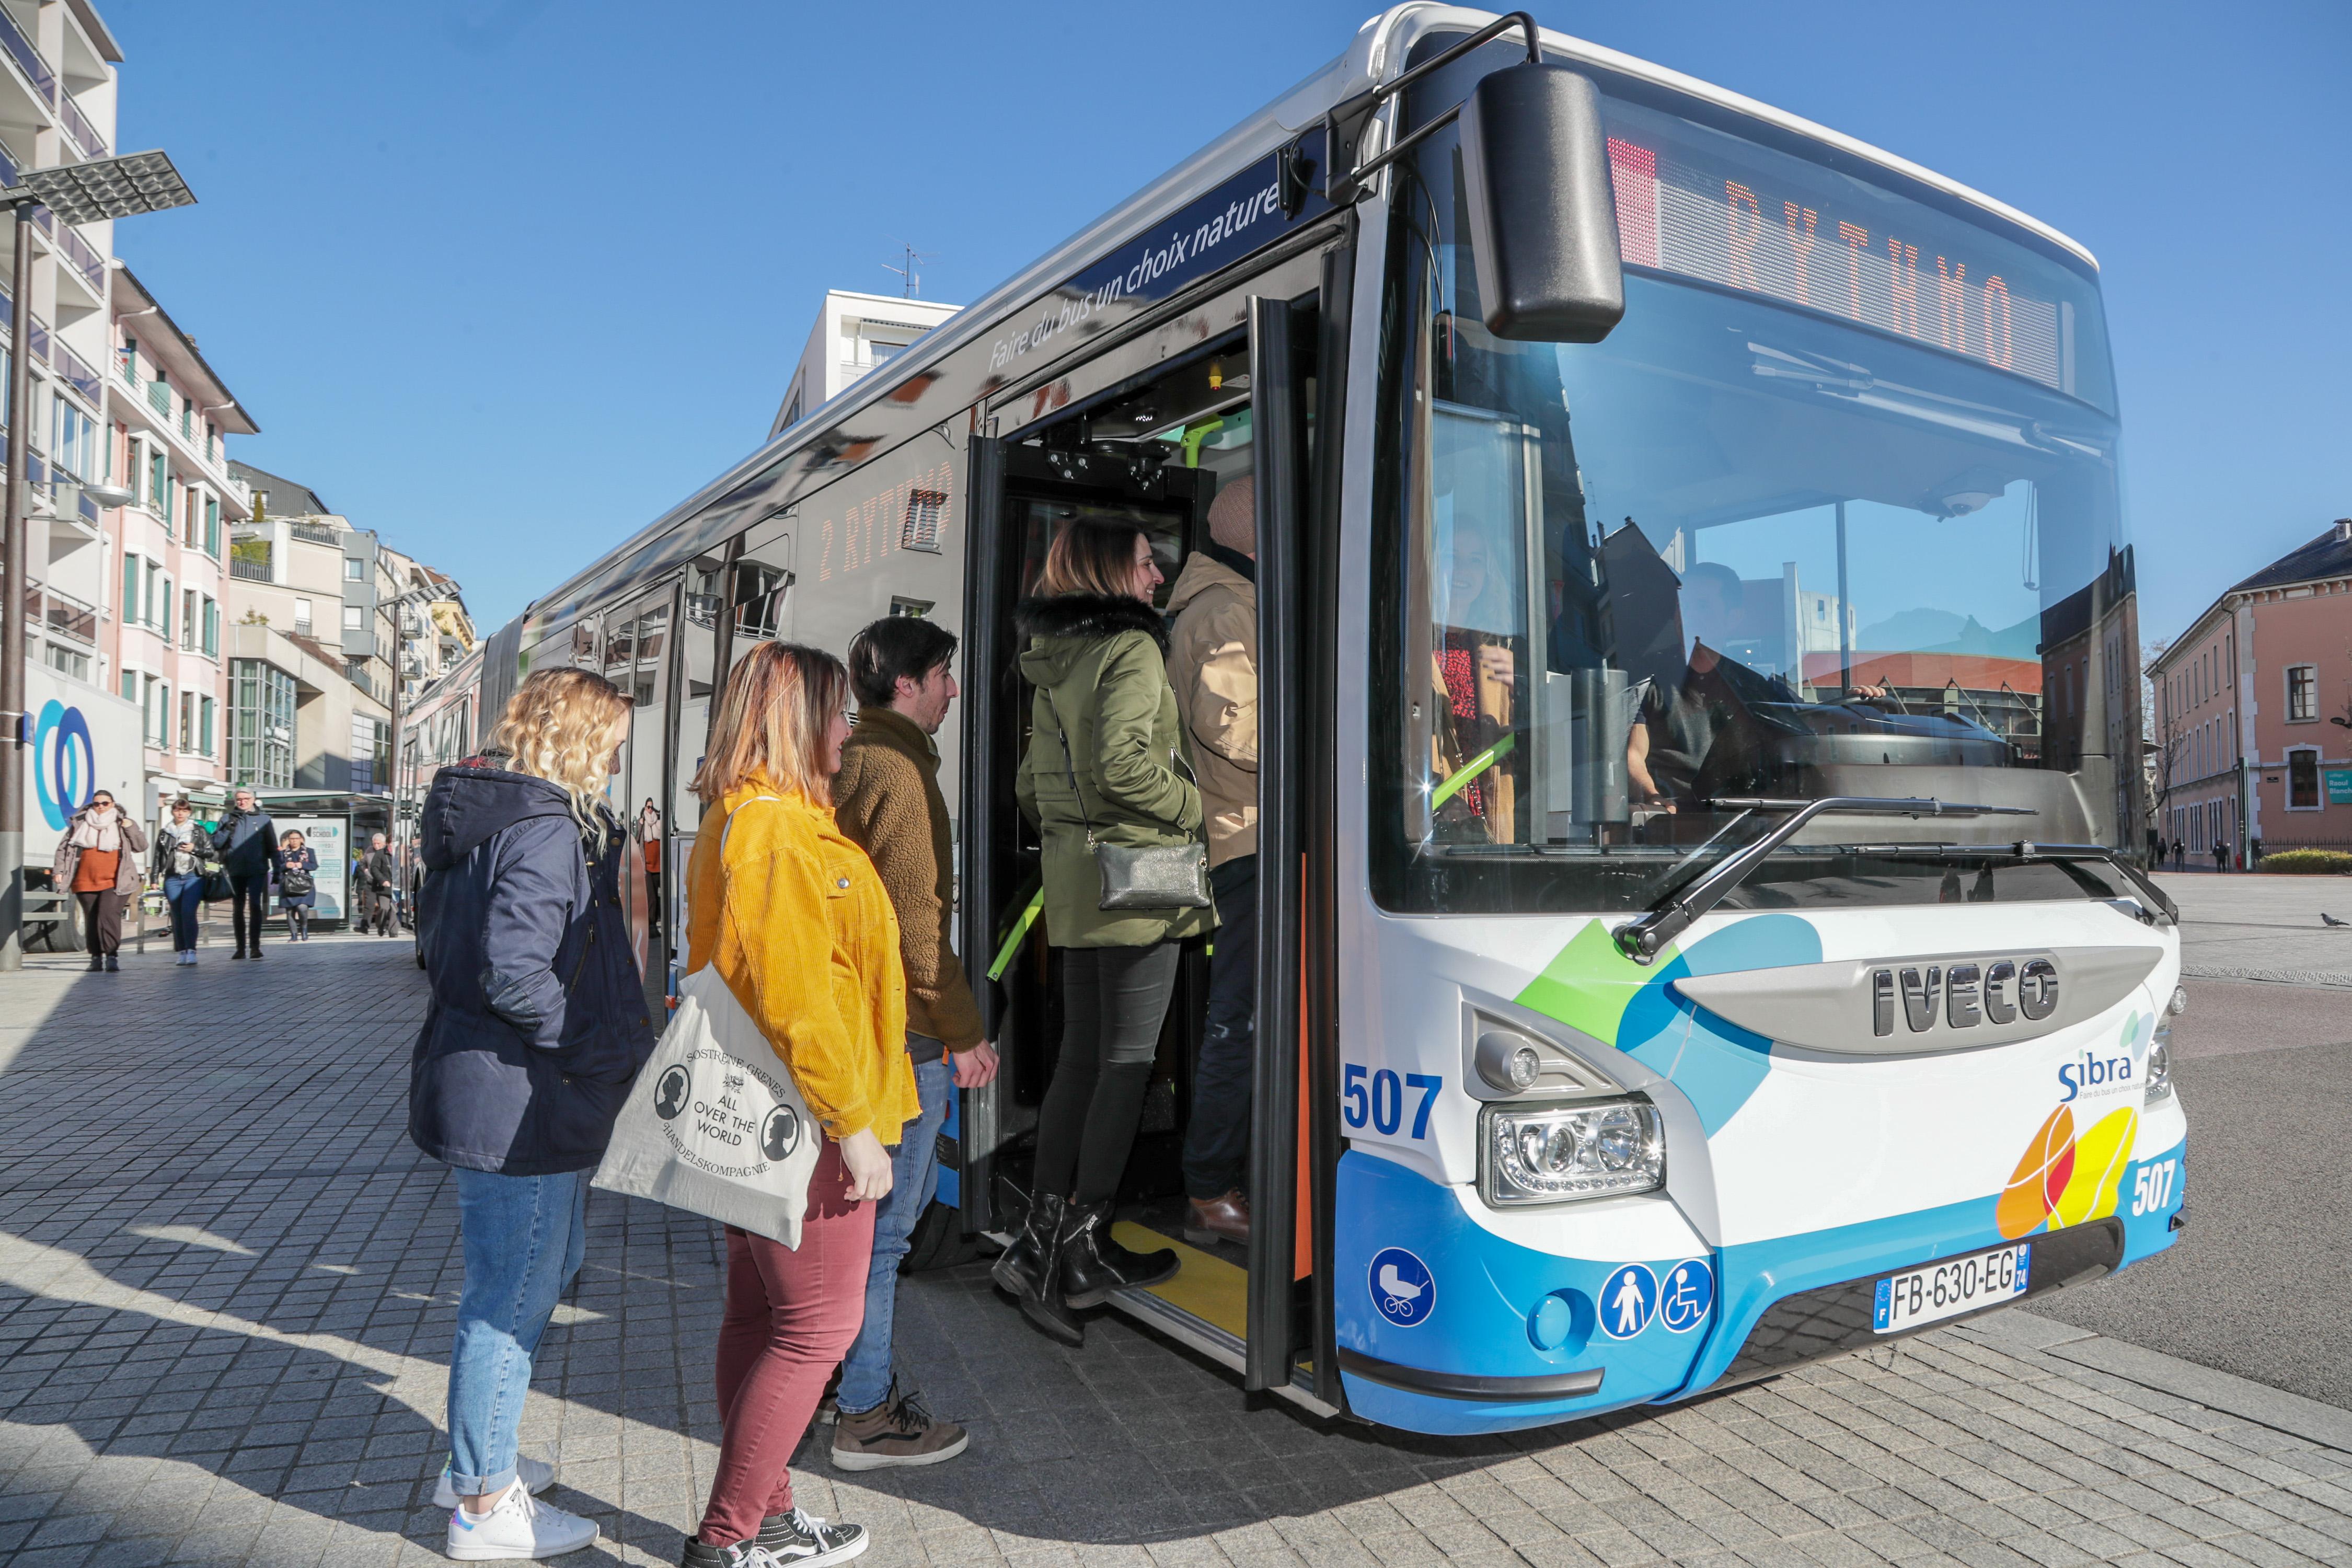 Bus Sibra Rythmo